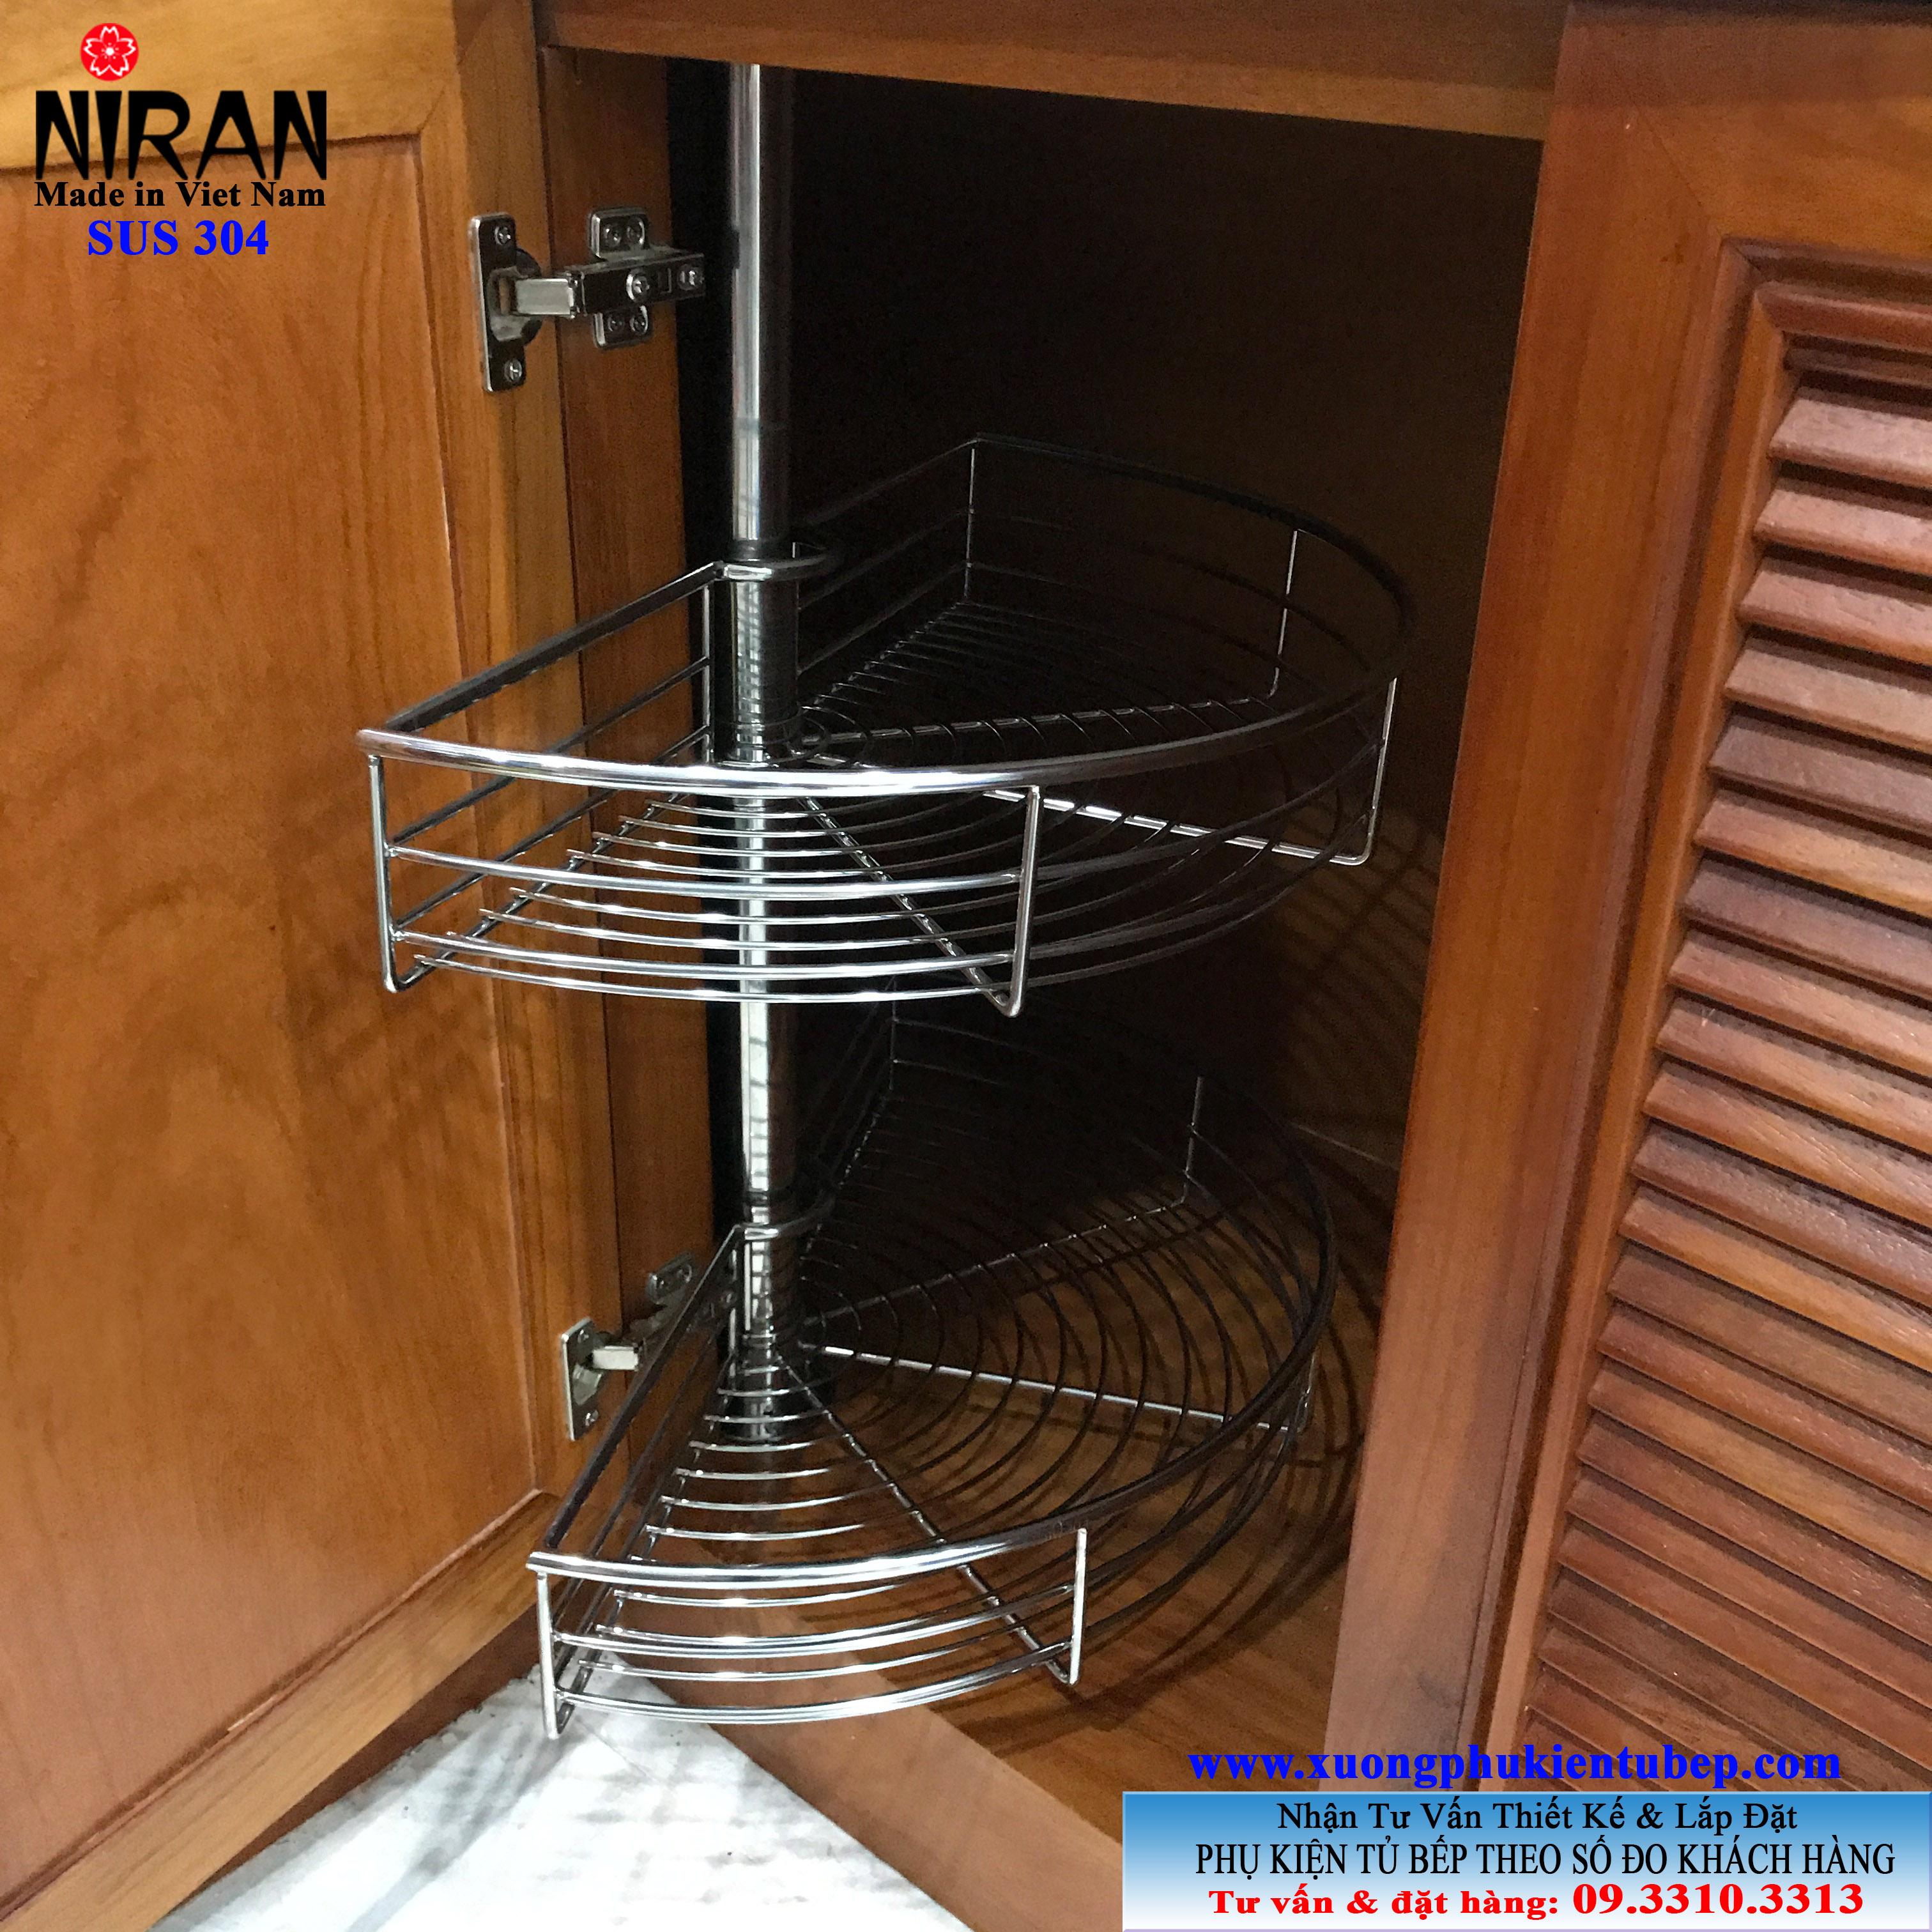 Mâm xoay 1-2 inox 304 Niran NR0703